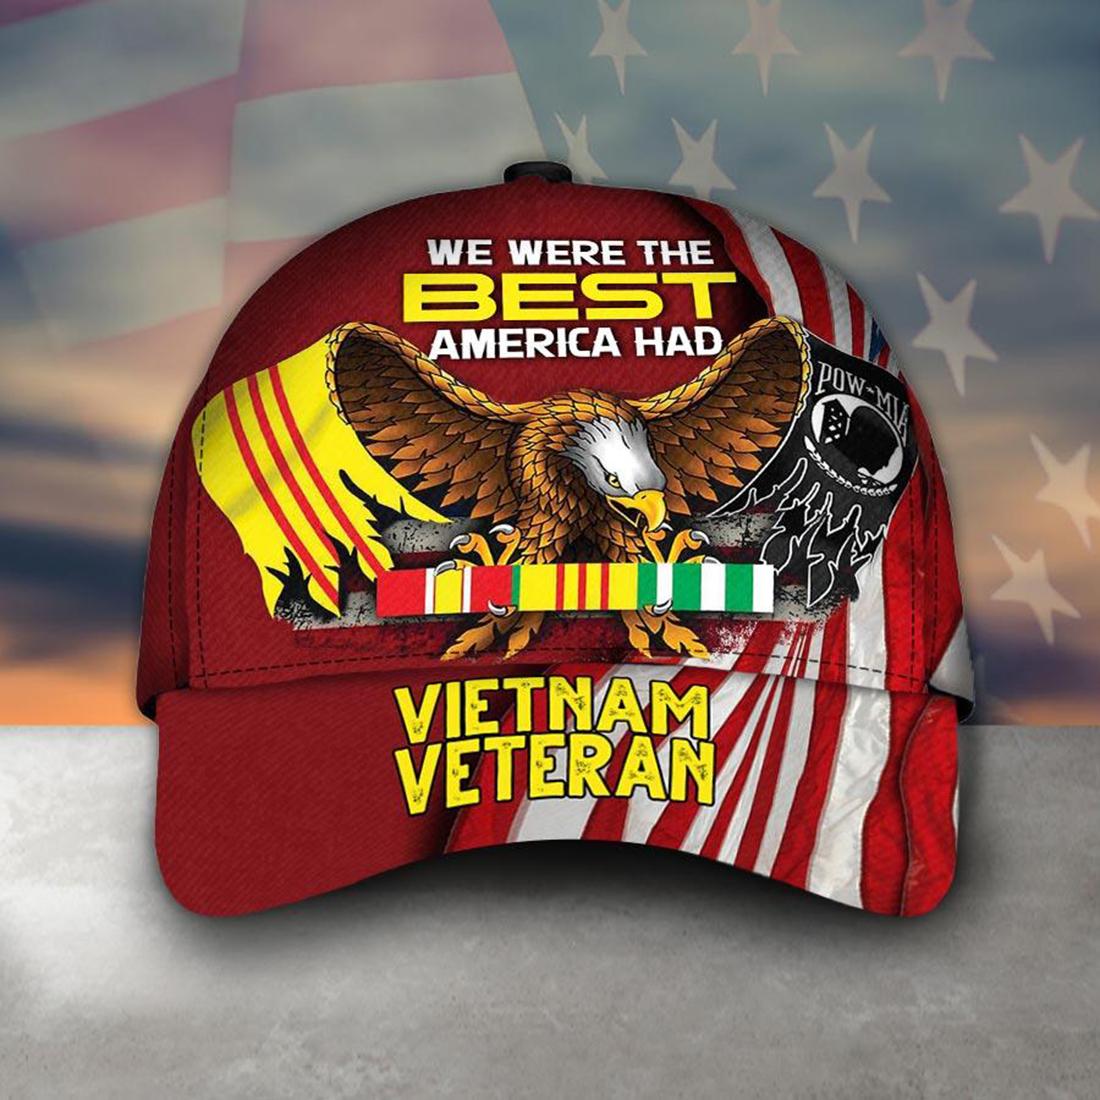 Armed forces Vietnam veteran America soldier cap hat